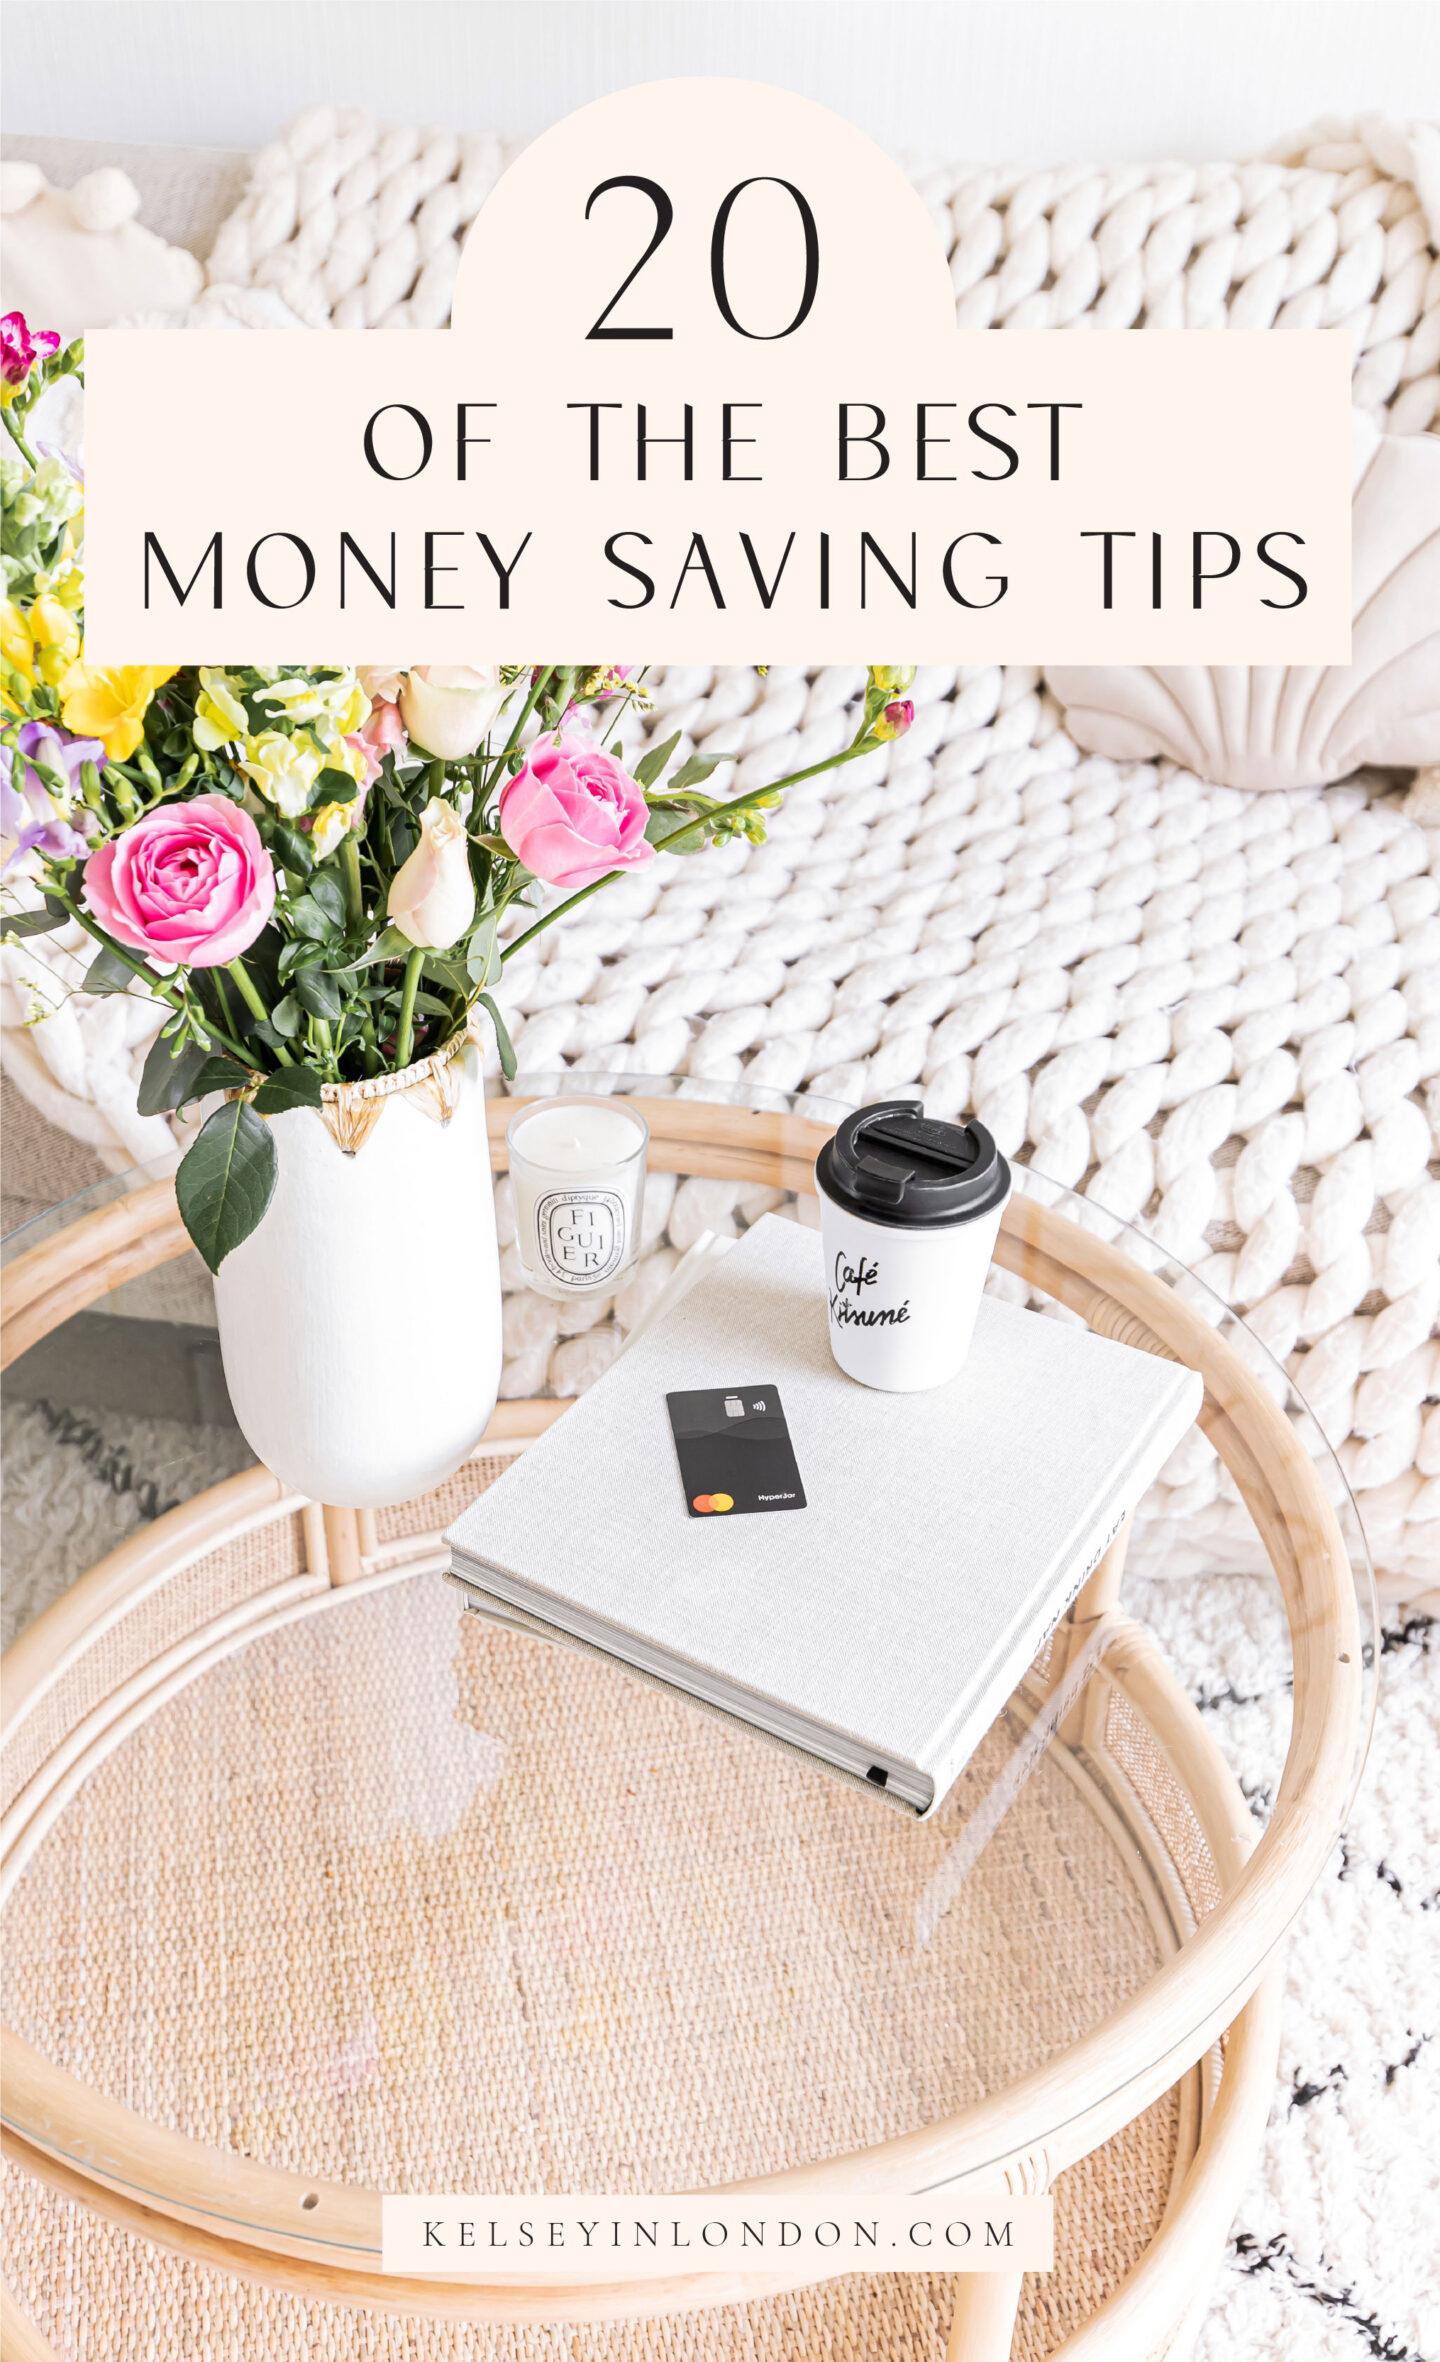 kelseyinlondon-homewithkelsey-kelsey-heinrichs-hyperjar-money-saving-tips-budgeting-hacks